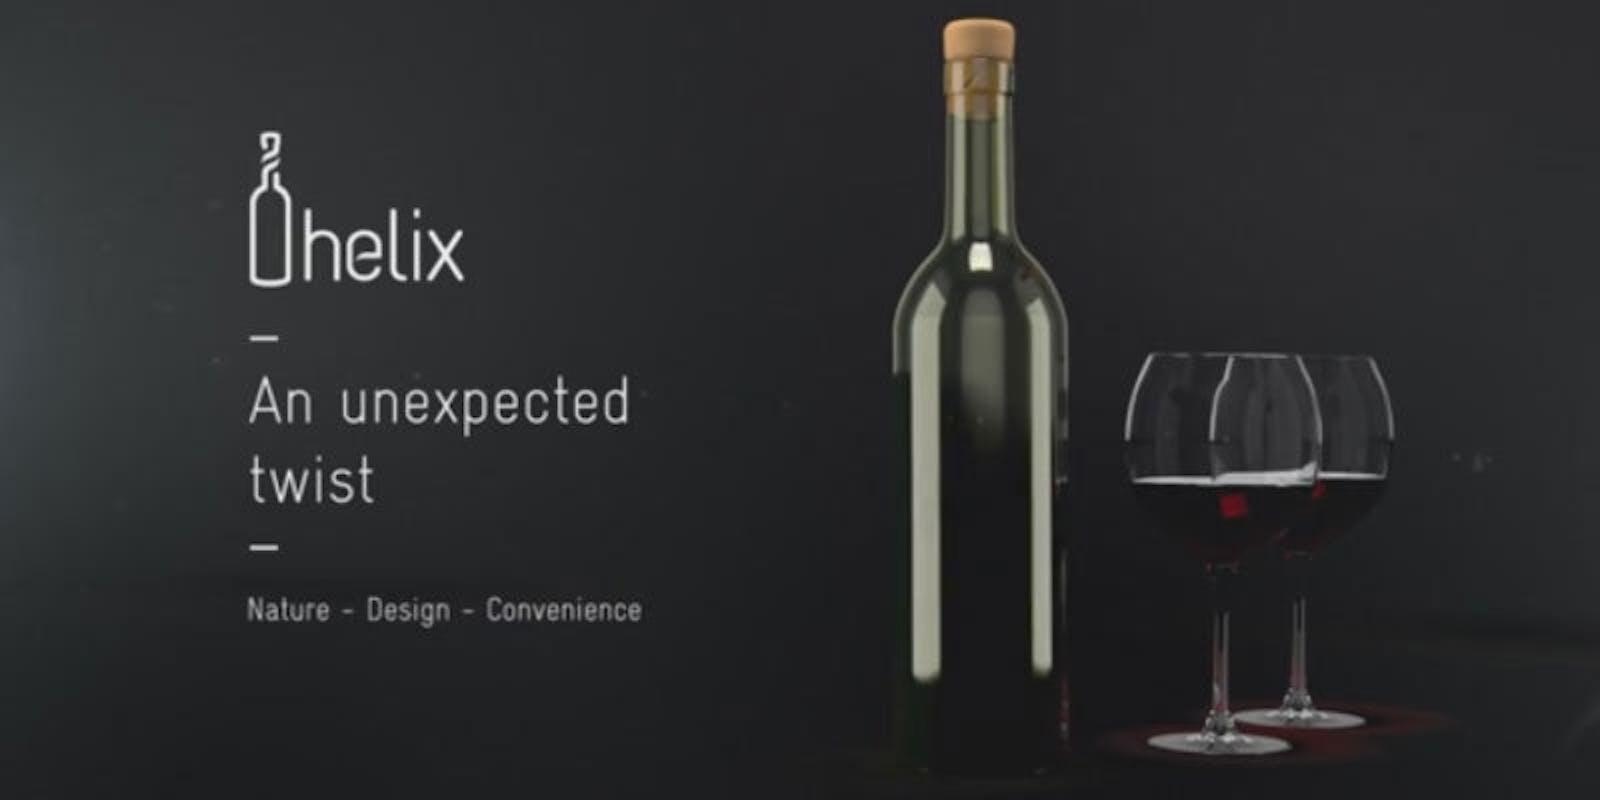 O-I award for Helix campaign